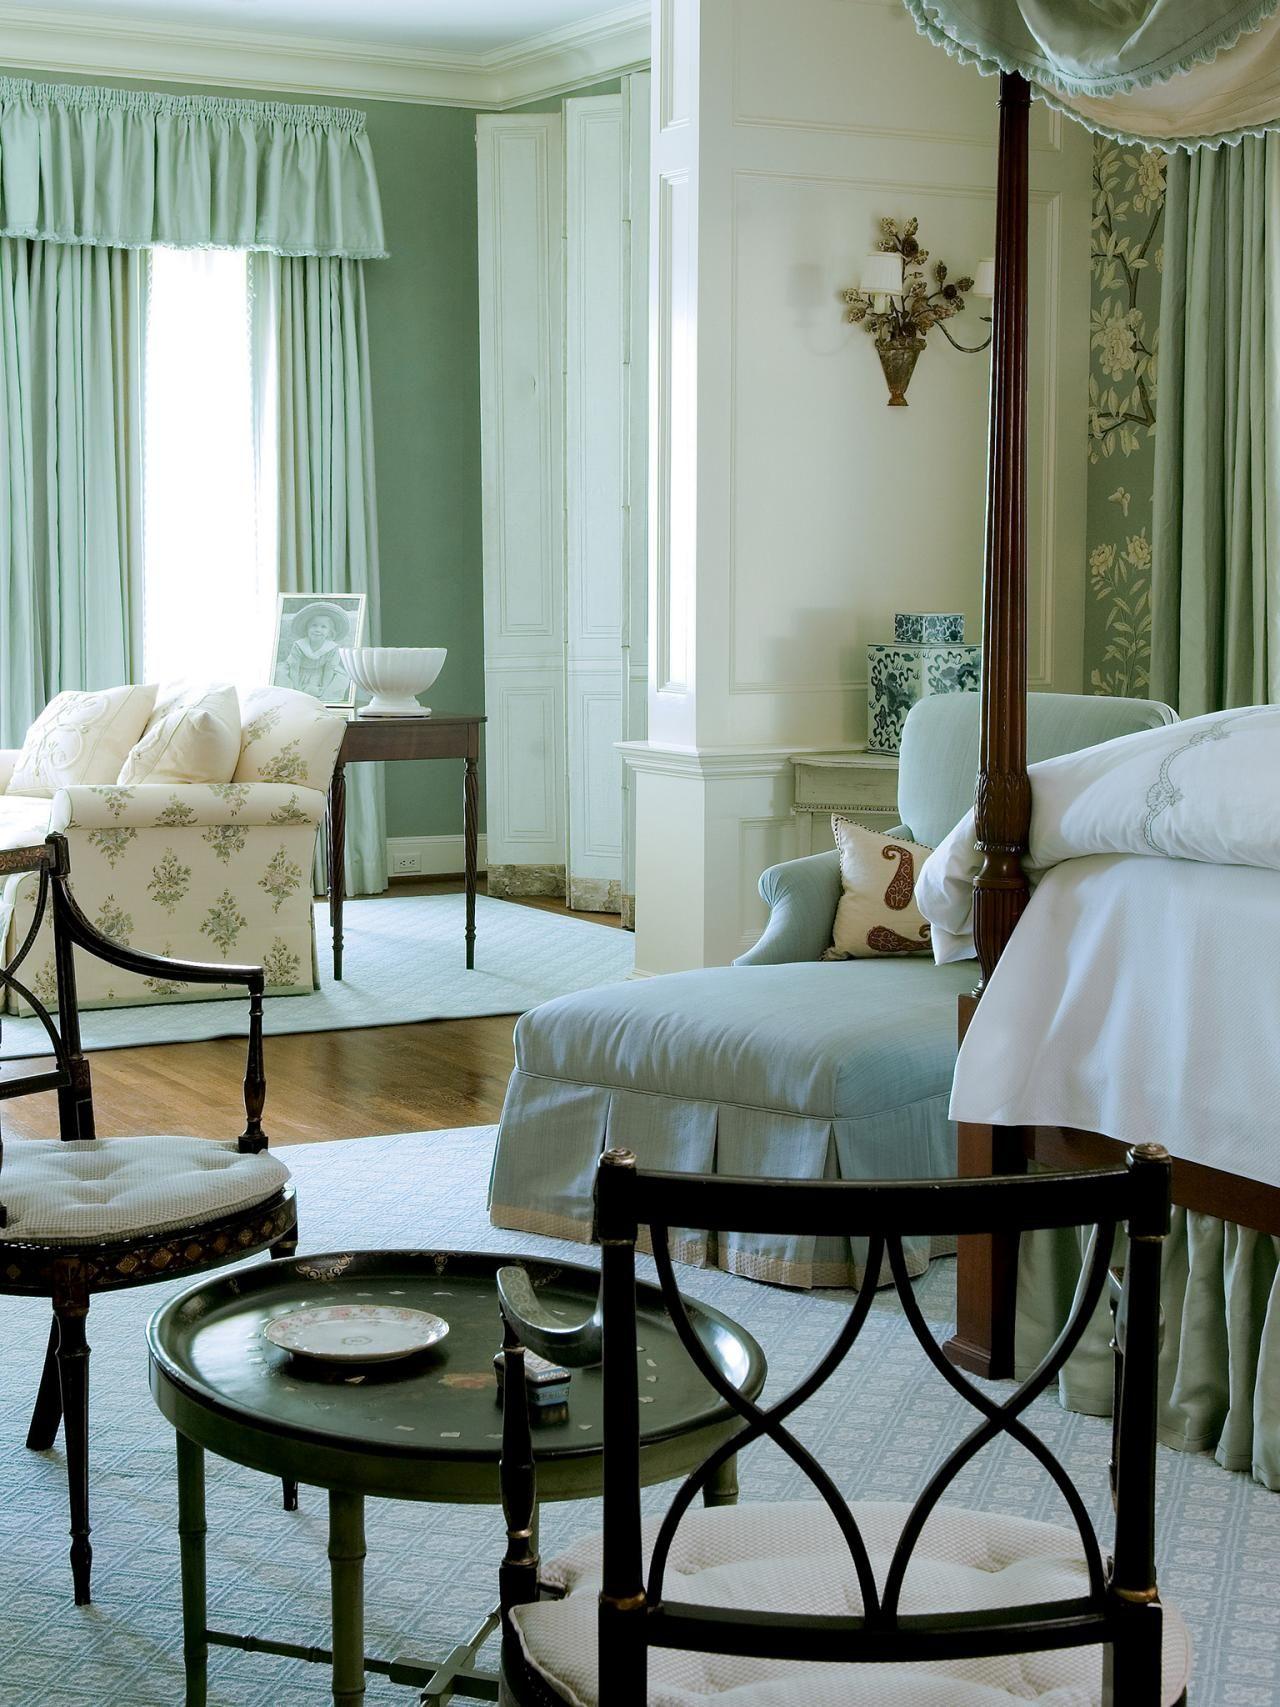 Soft mint hues define this elegant traditional master